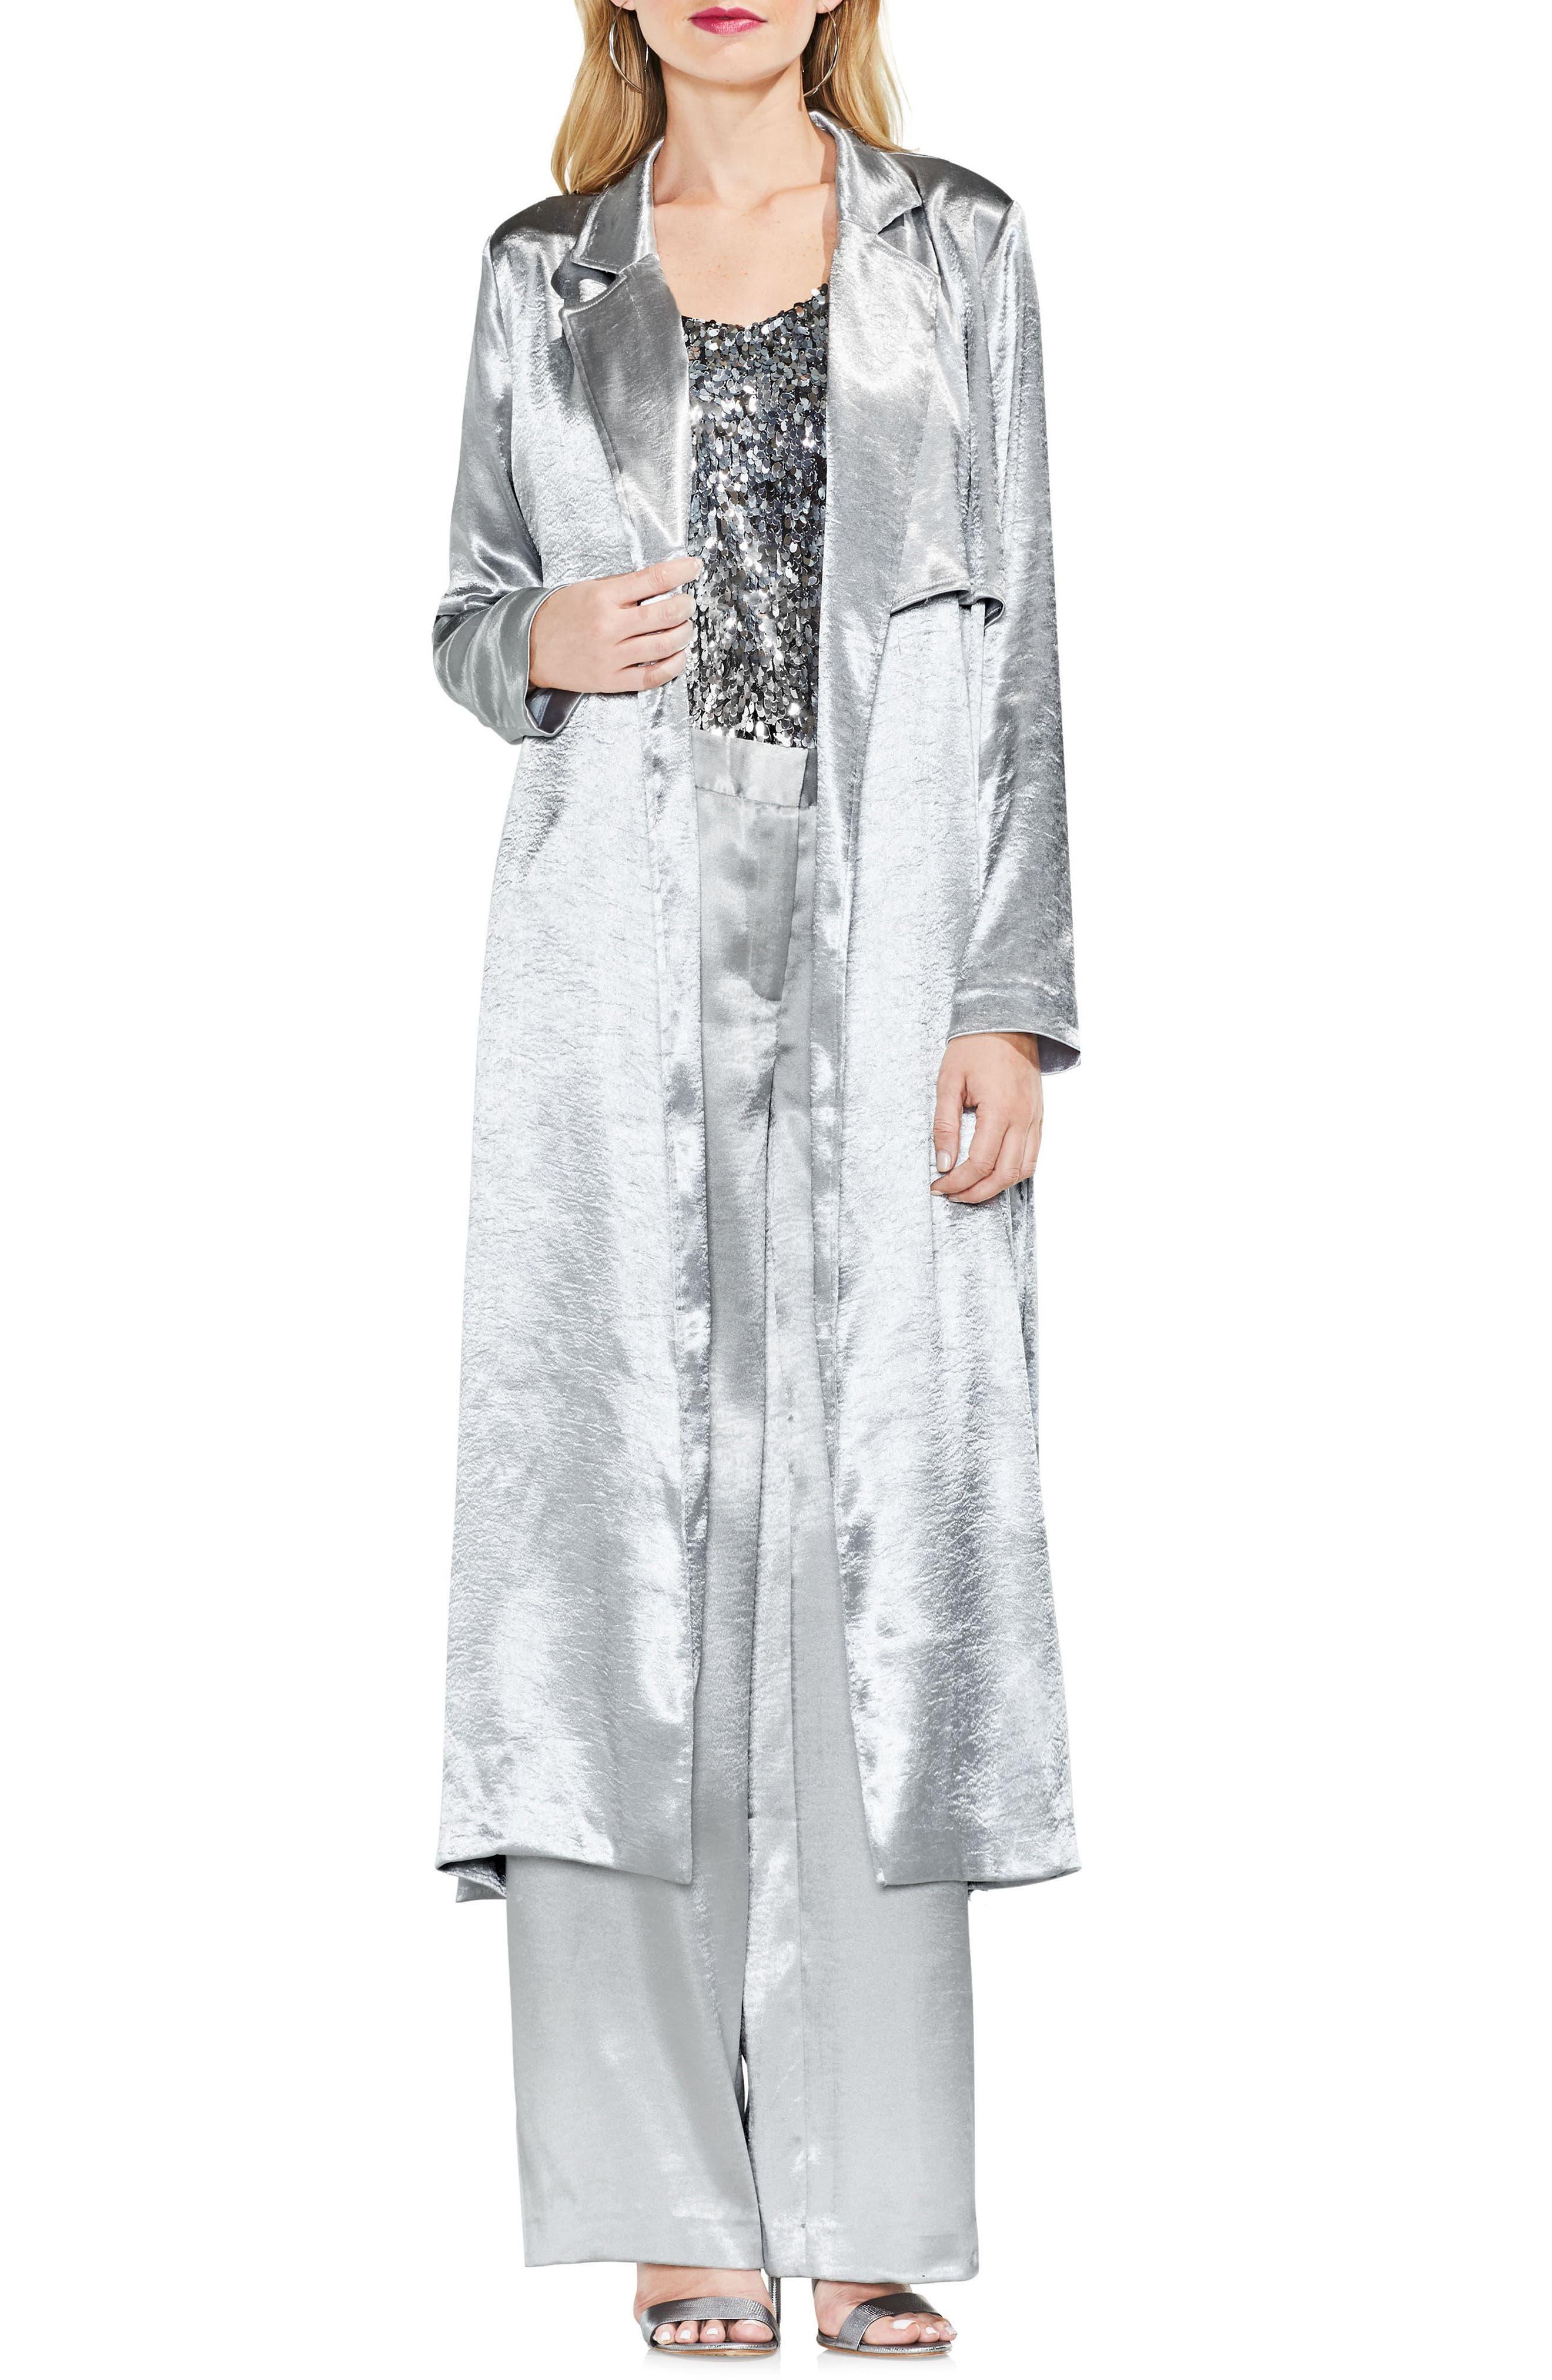 Rumple Satin Trench Coat,                         Main,                         color,